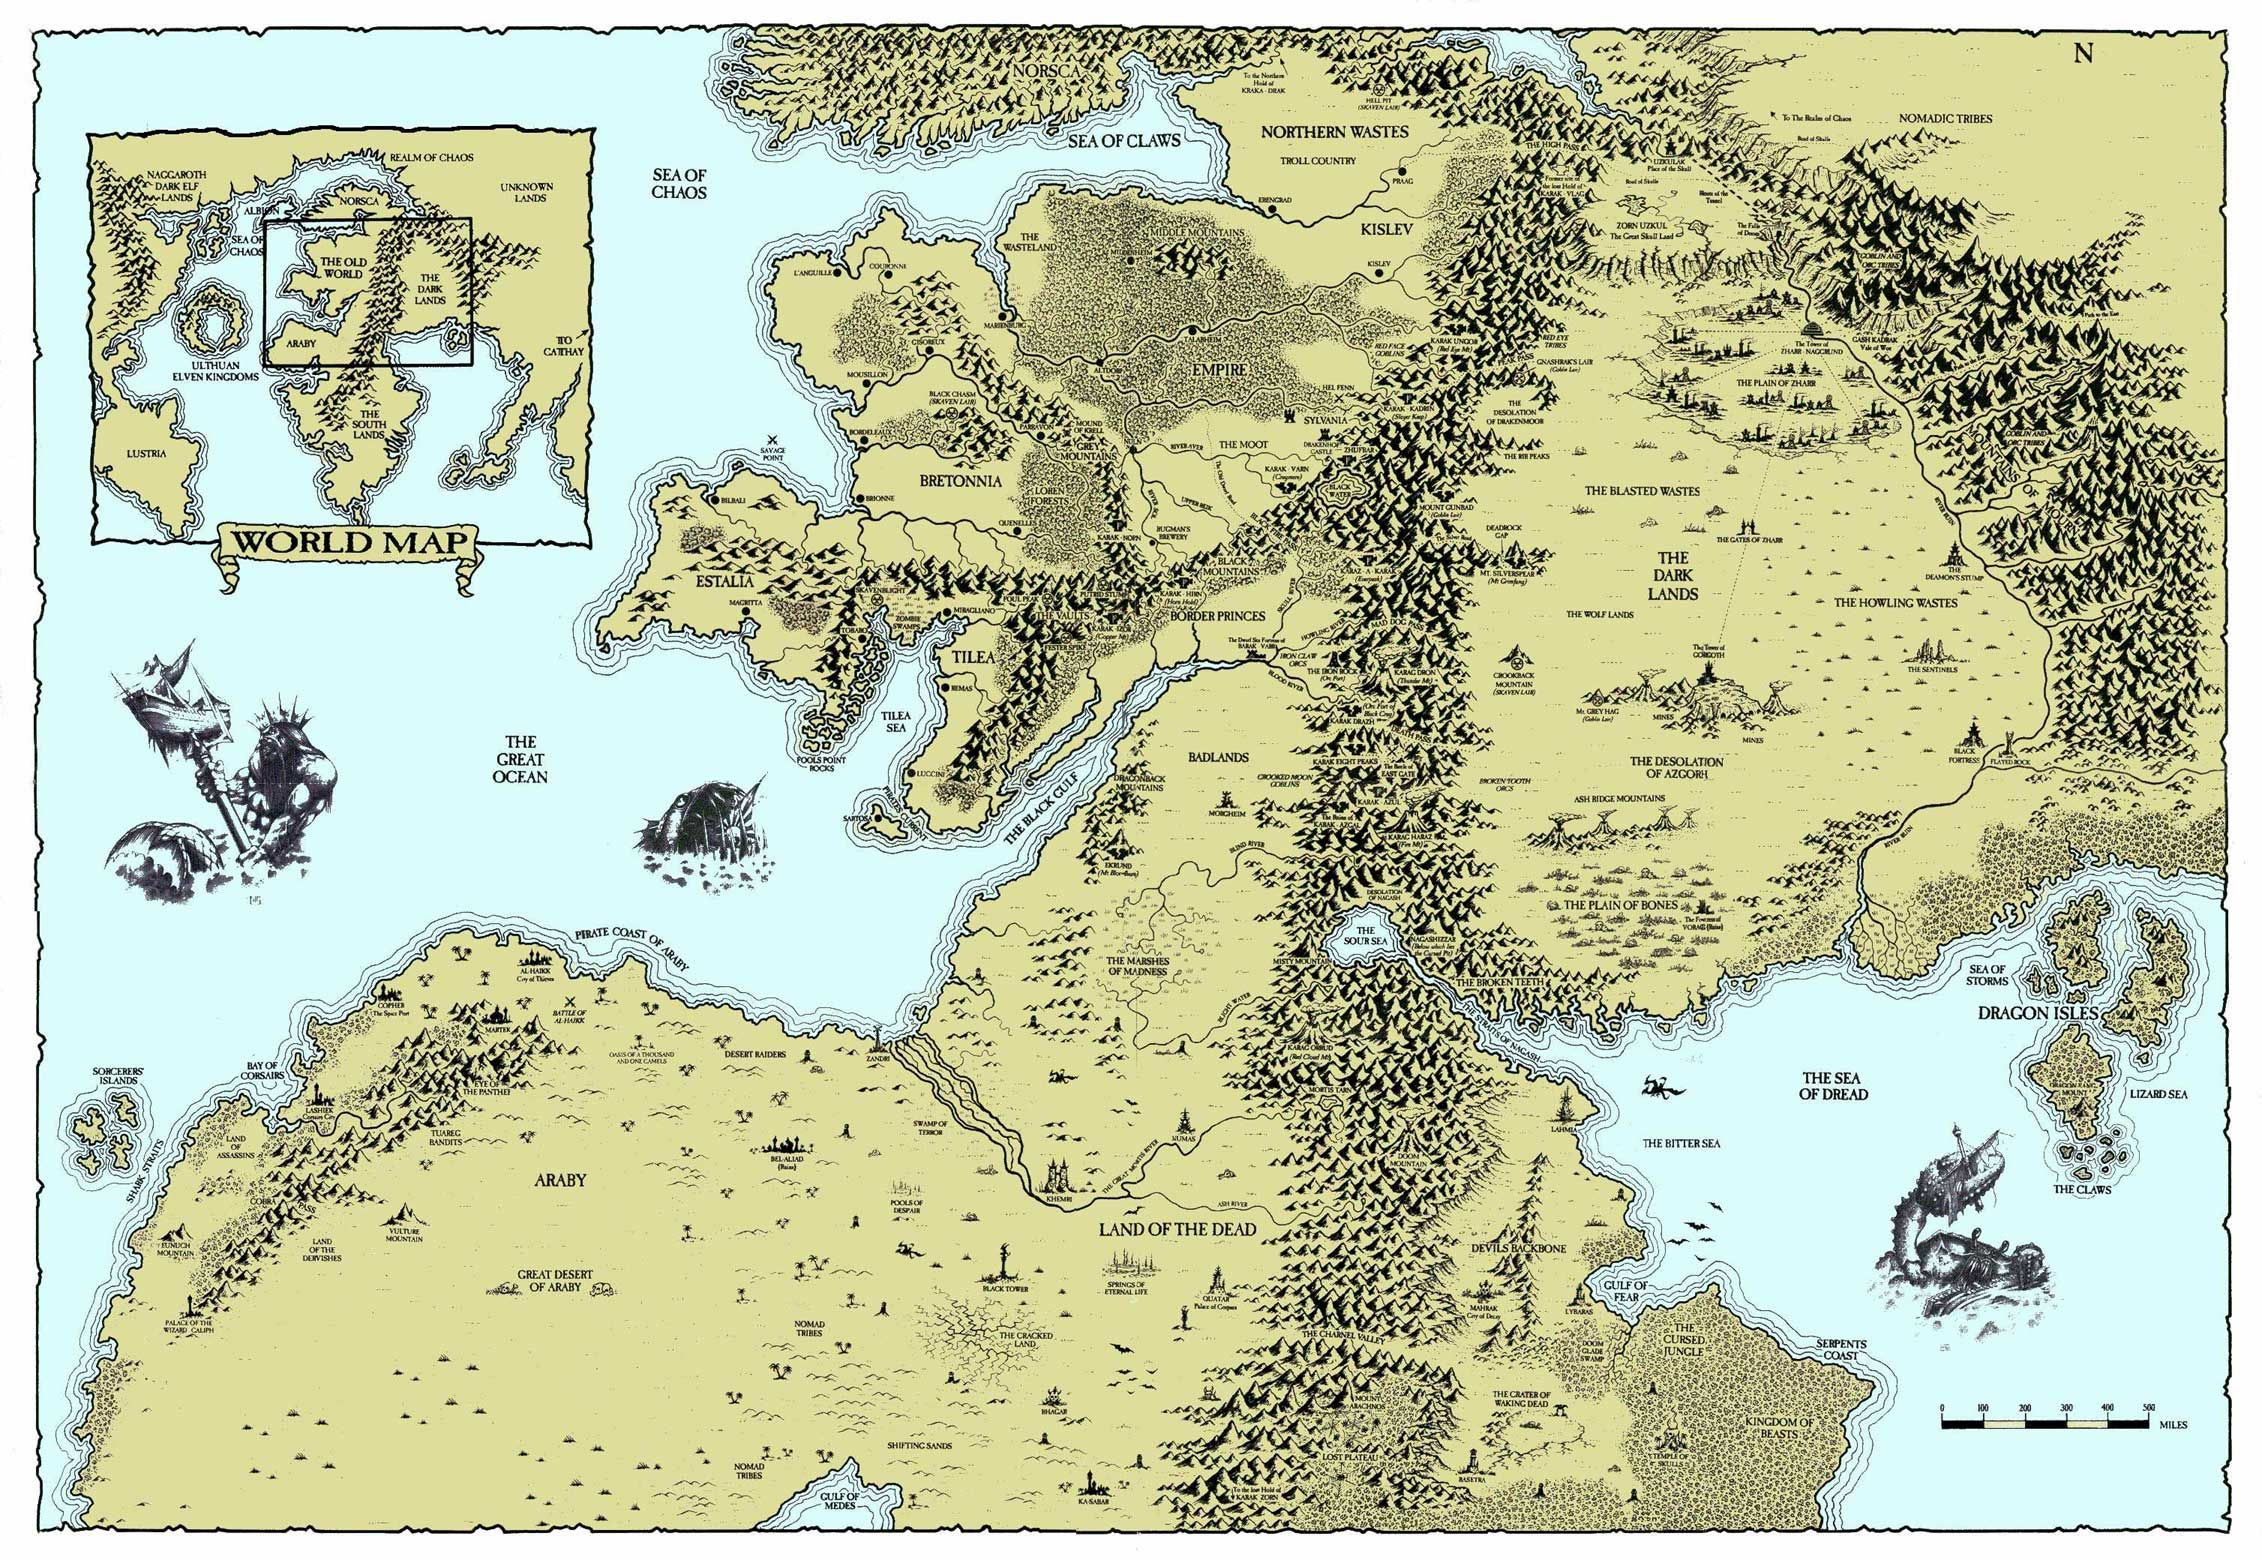 Warhammer World Map | Maps in 2019 | Fantasy world map, Fantasy